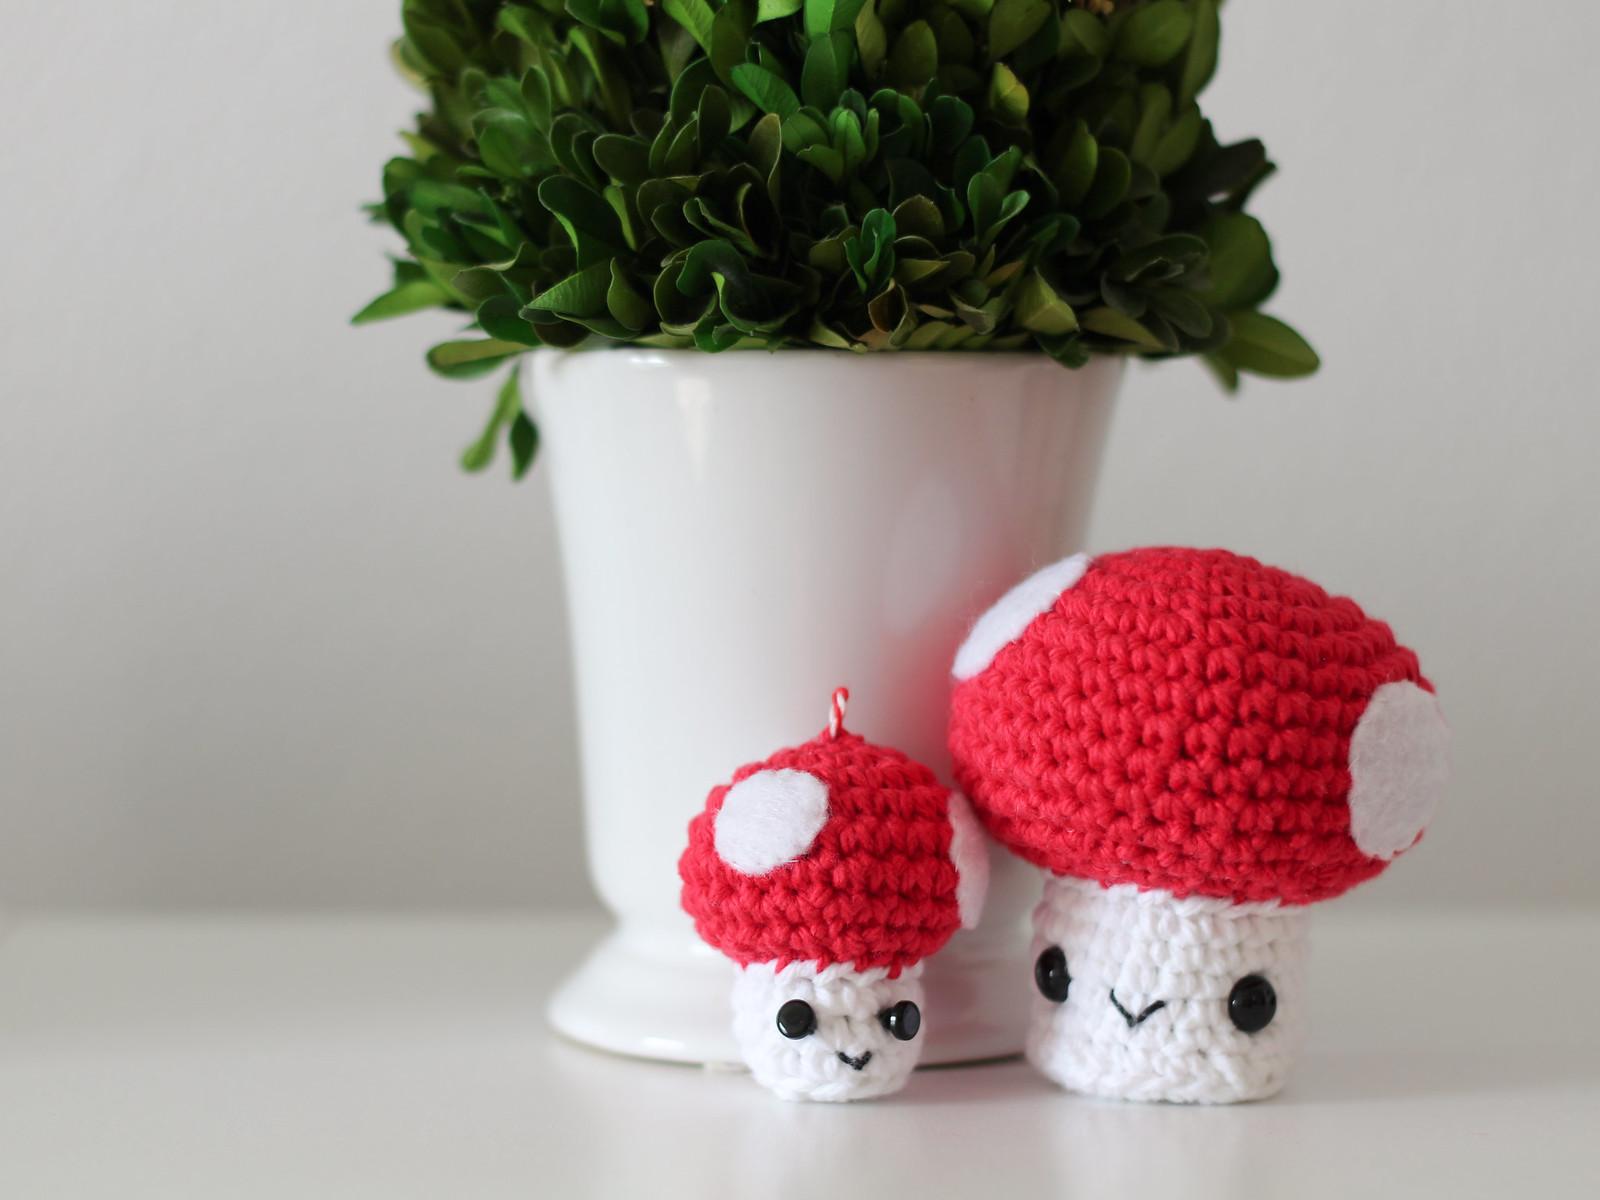 Mama and Baby Mushroom